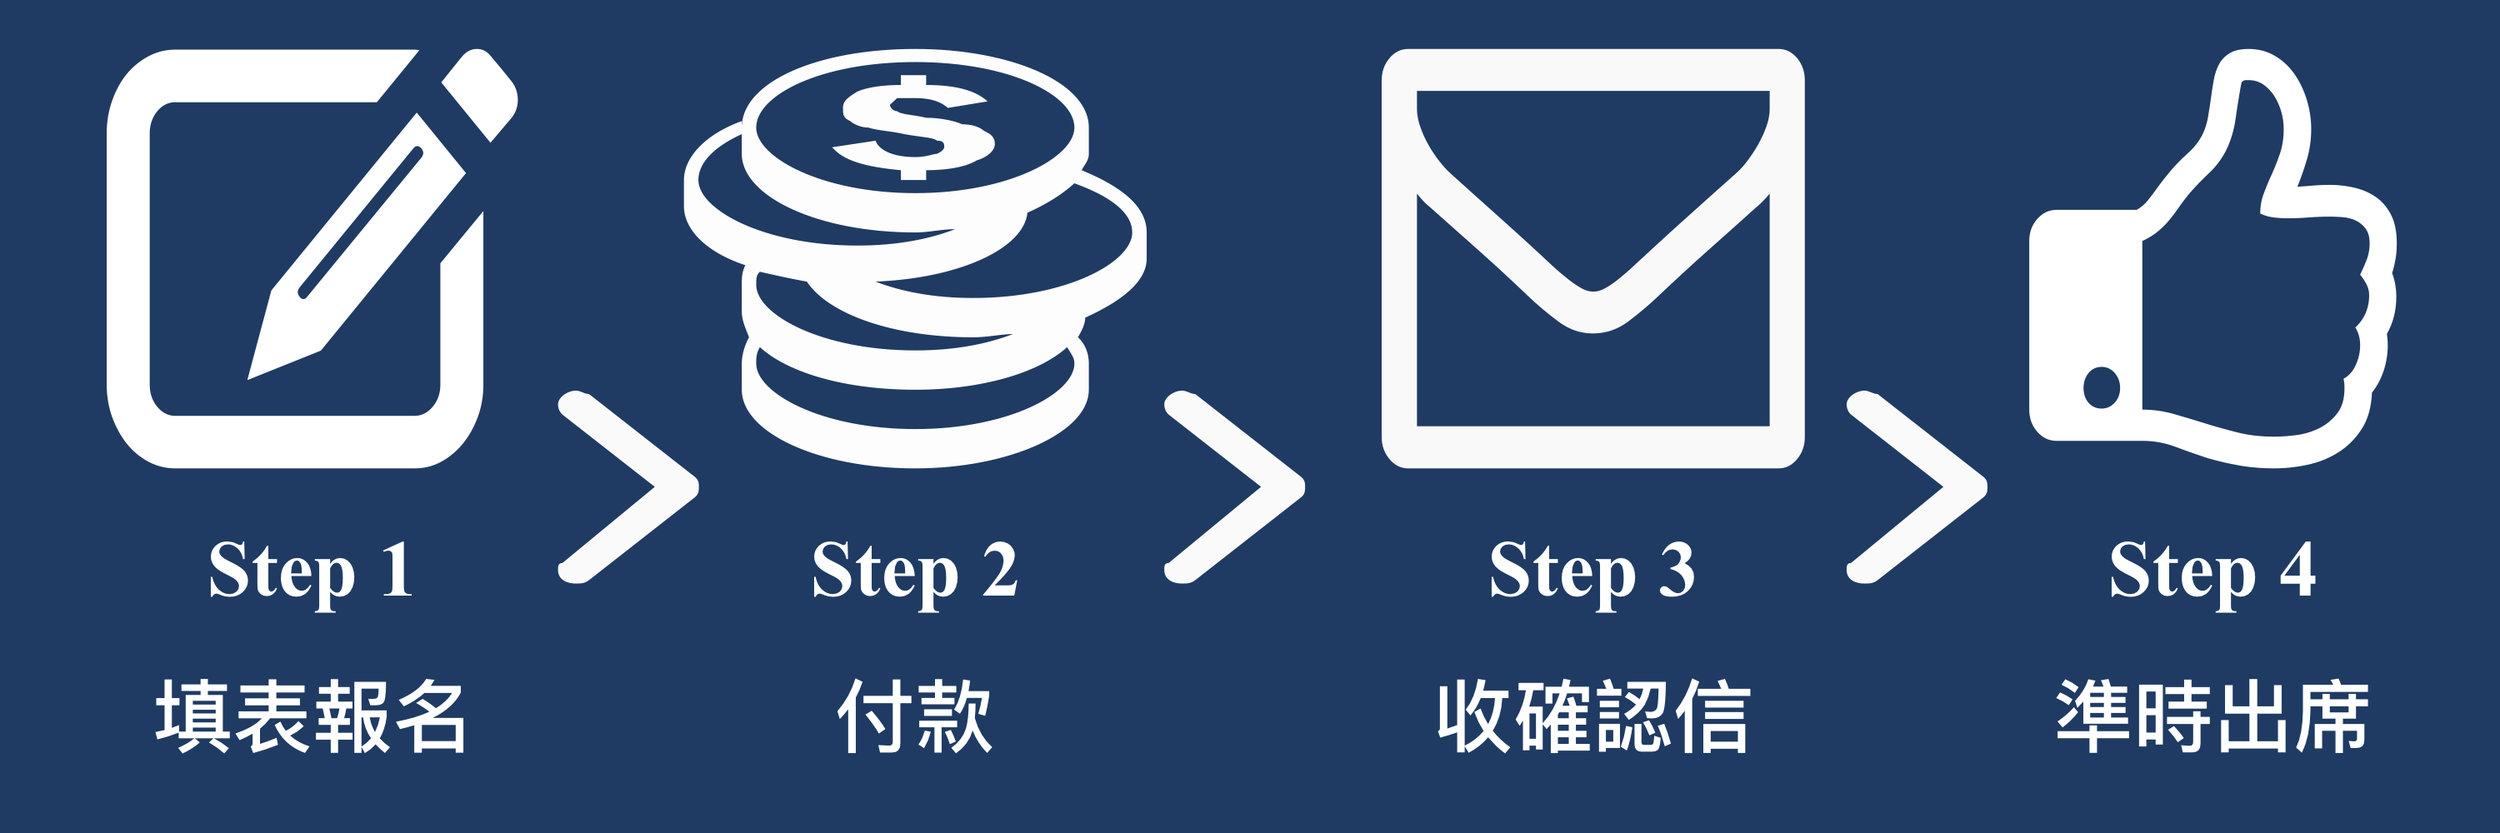 step chart.001.jpeg